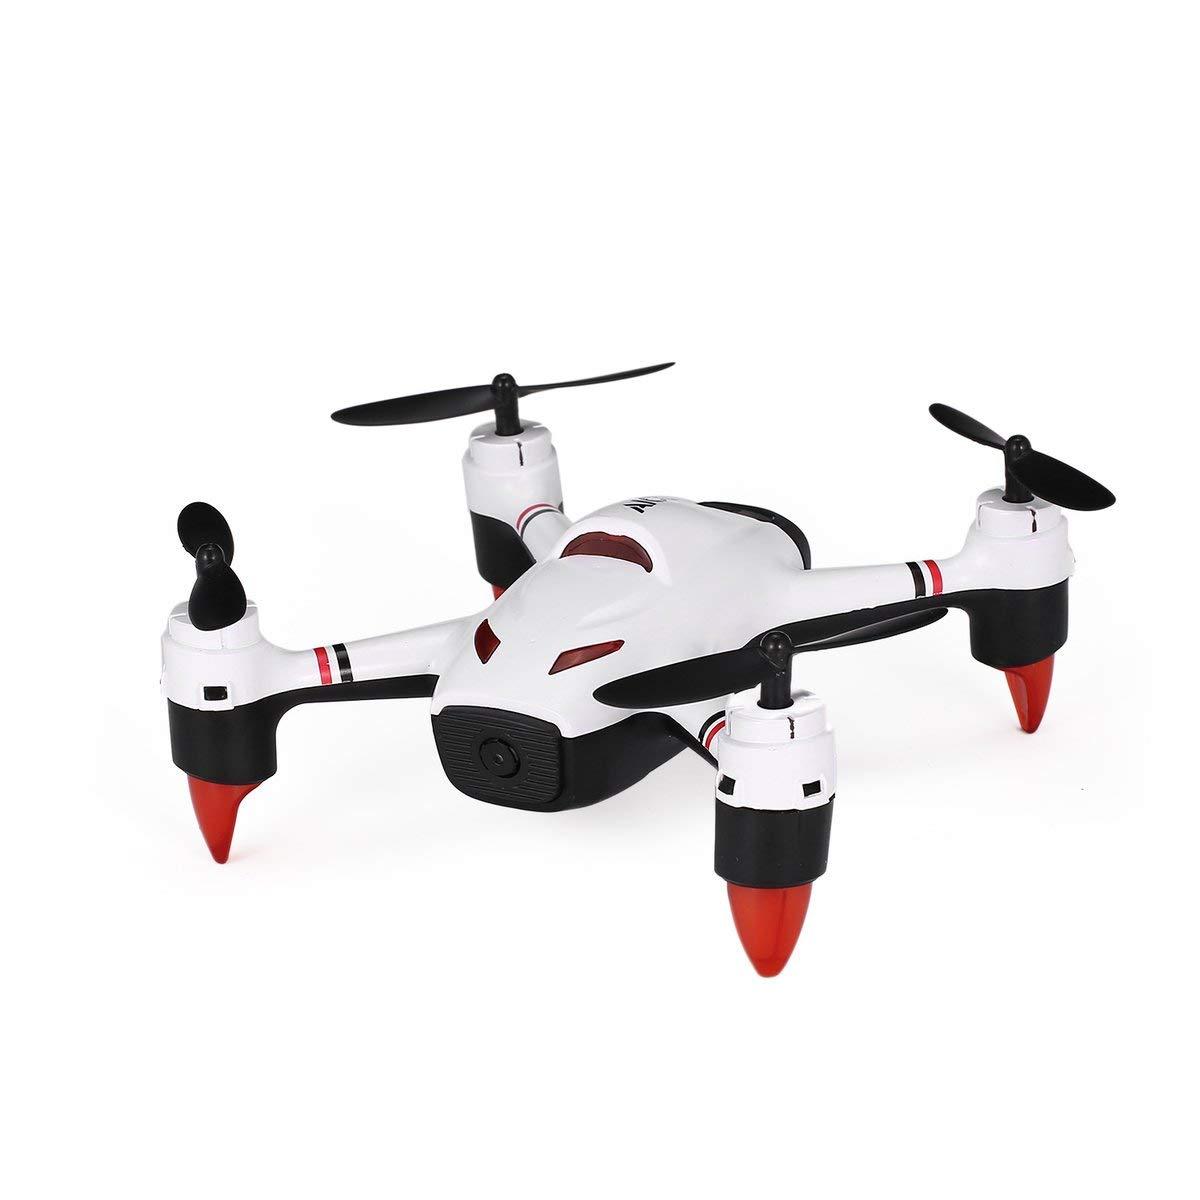 Gugutogo F23G 2.4G RC Drone Mini Quadcopter mit 720 P HD WiFi FPV Kamera Flow Positionierung Geste Kopflosen Modus